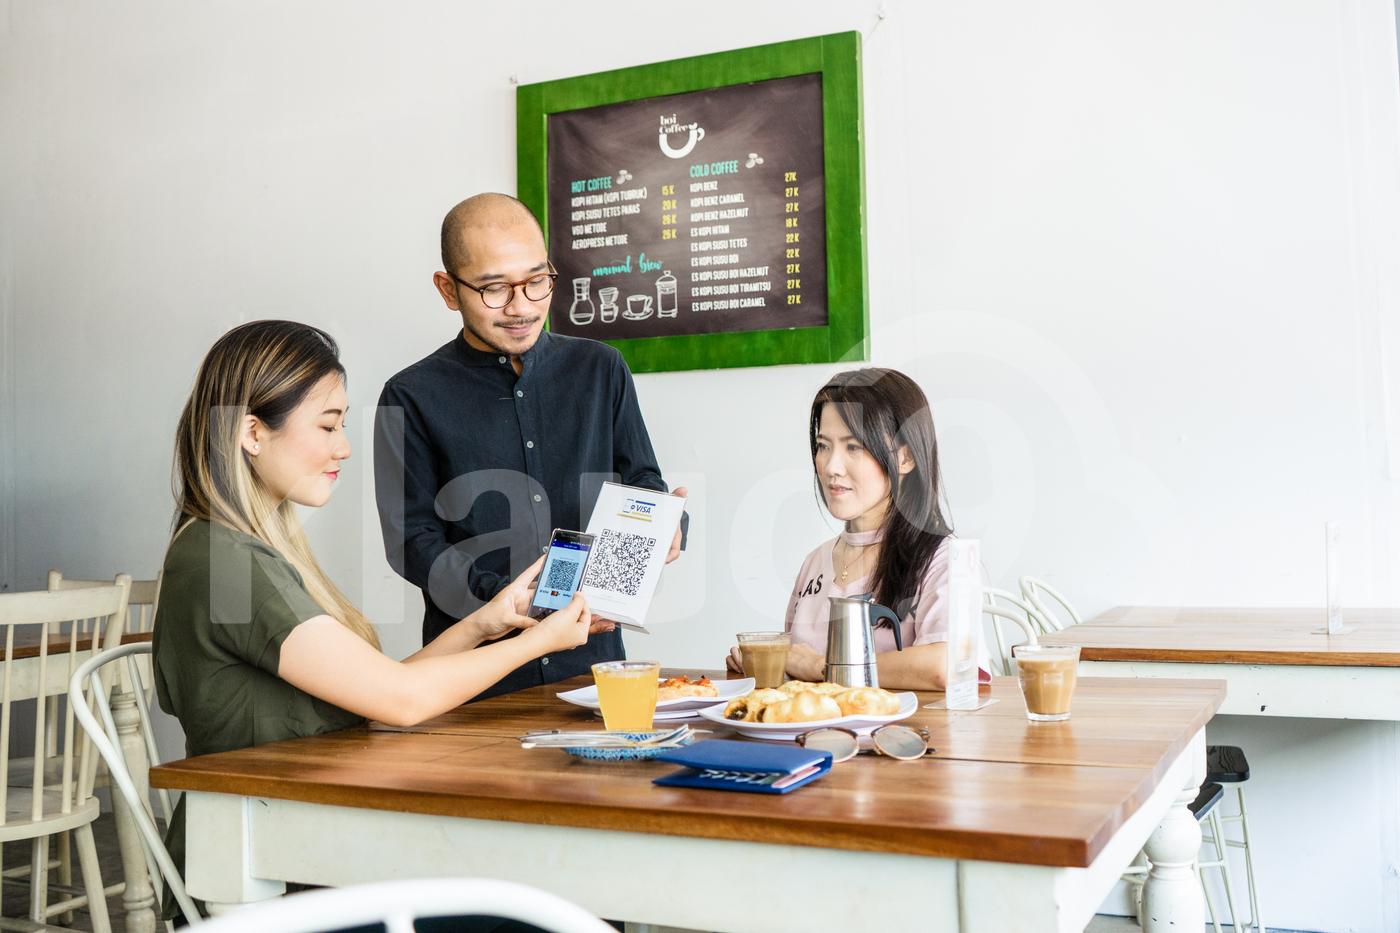 Asian woman scanning QR code in a  restaurant